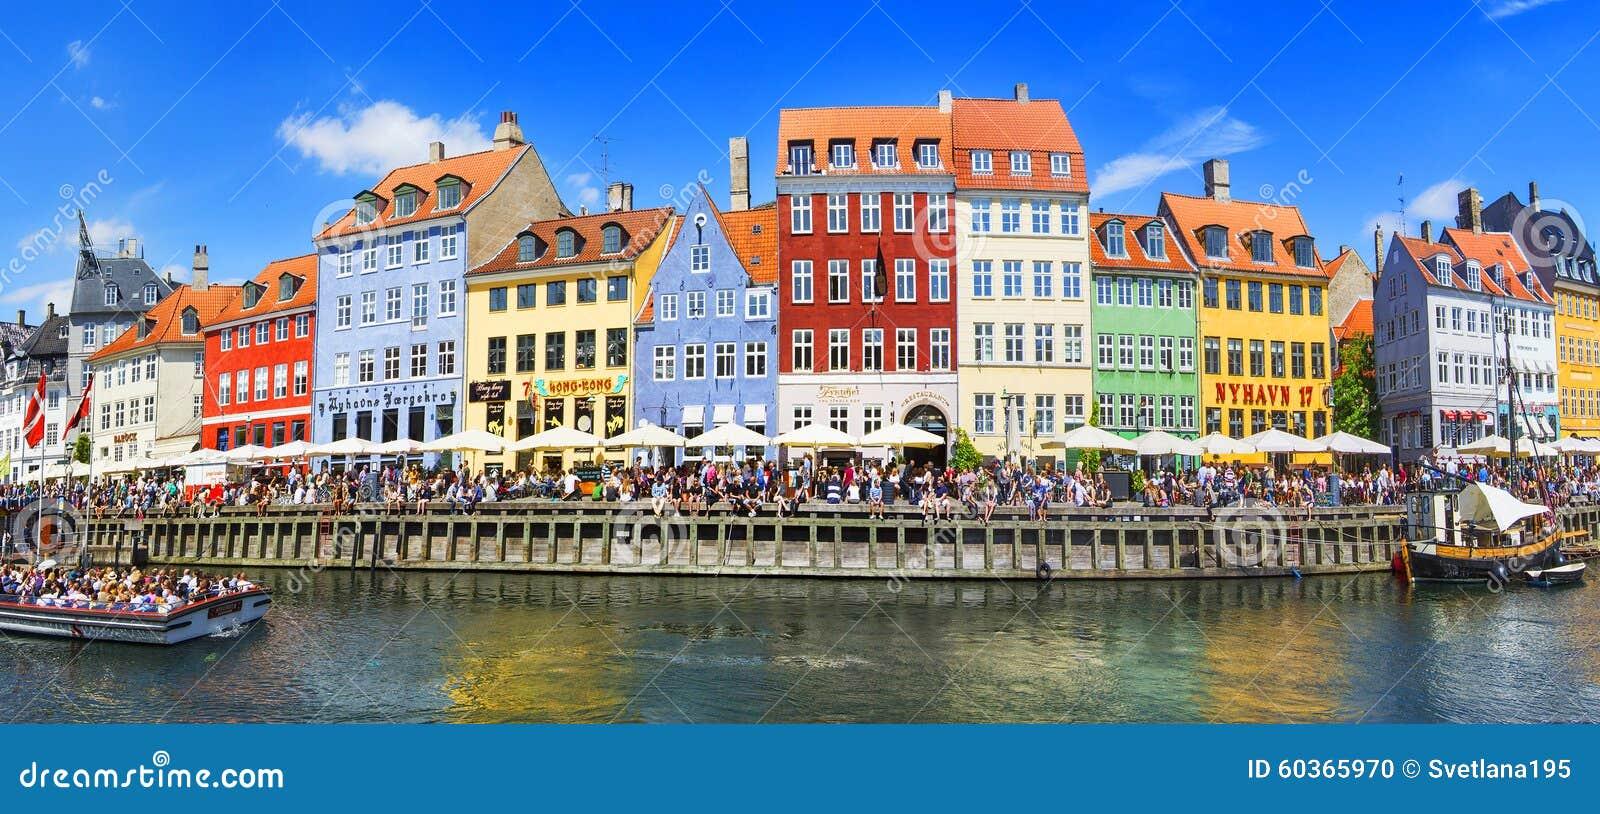 COPENHAGA, DINAMARCA - 7 DE JULHO: Distrito de Nyhavn em Copenhaga dinamarca